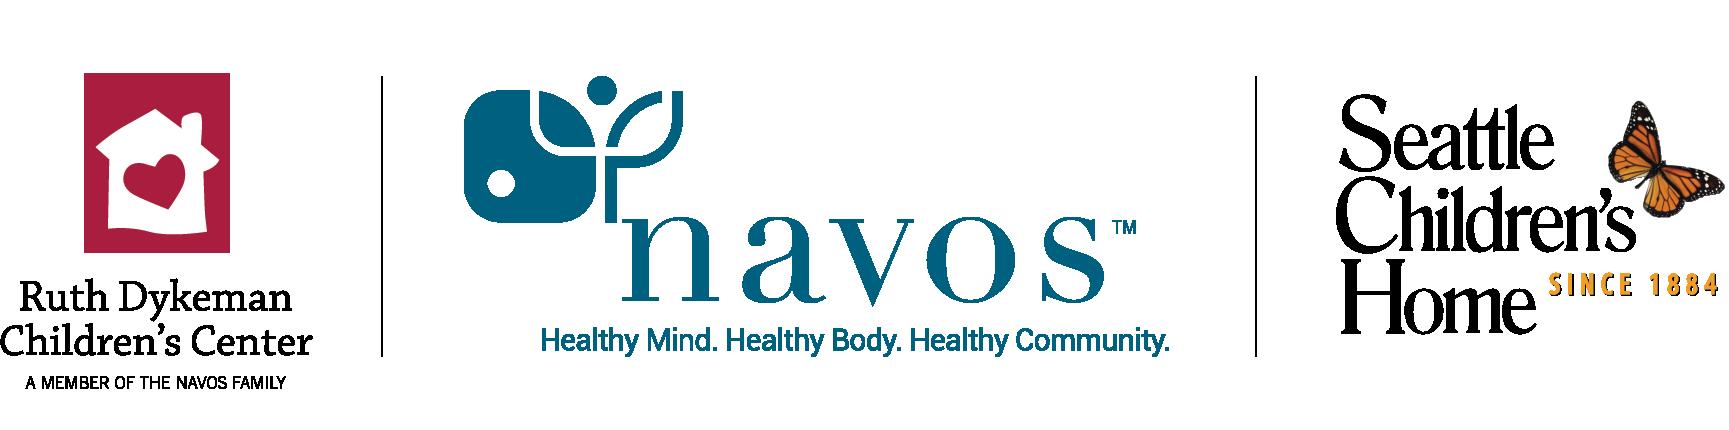 RDCC_Navos_SCH_Lockup_v1_1729x430